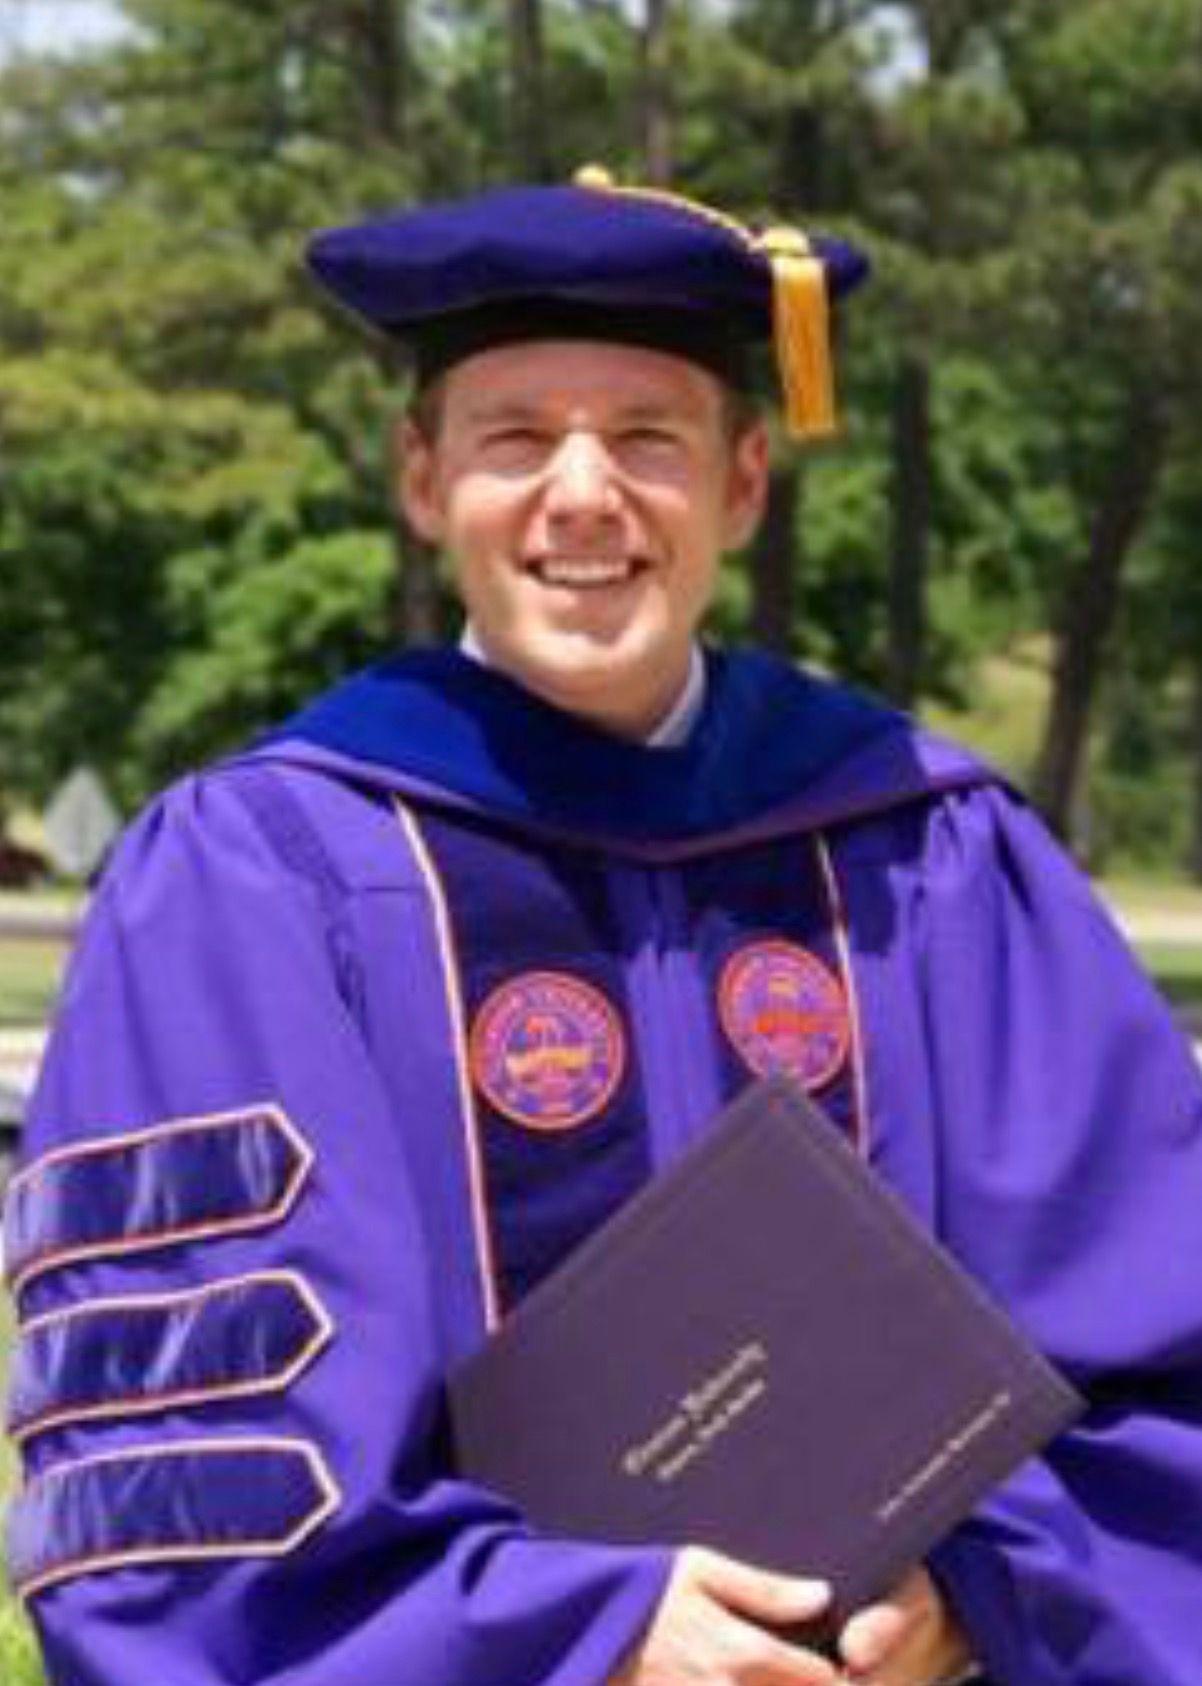 Clemson University regalia | Clergy/Academic | Pinterest